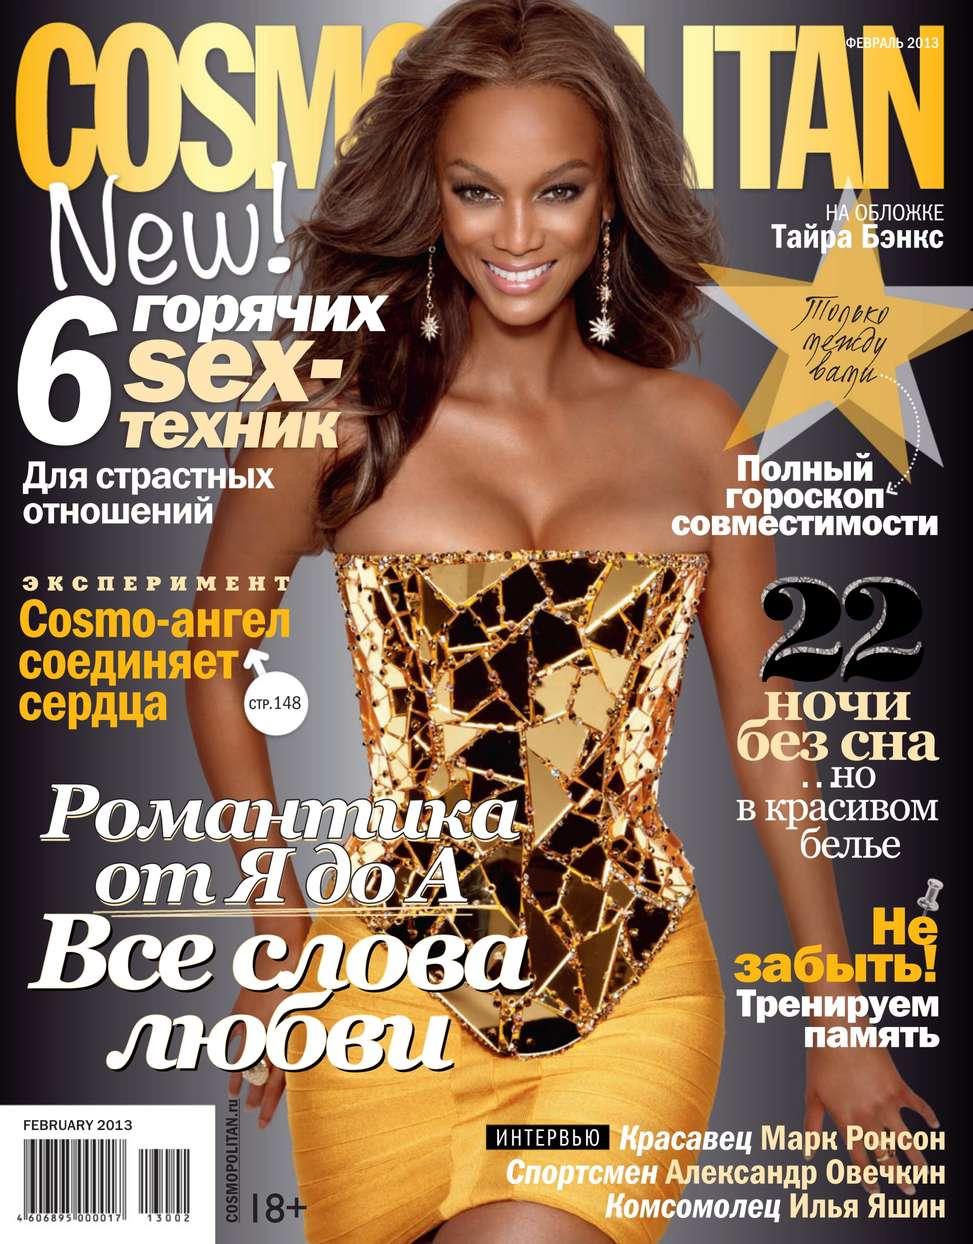 Cosmopolitan 02-2013